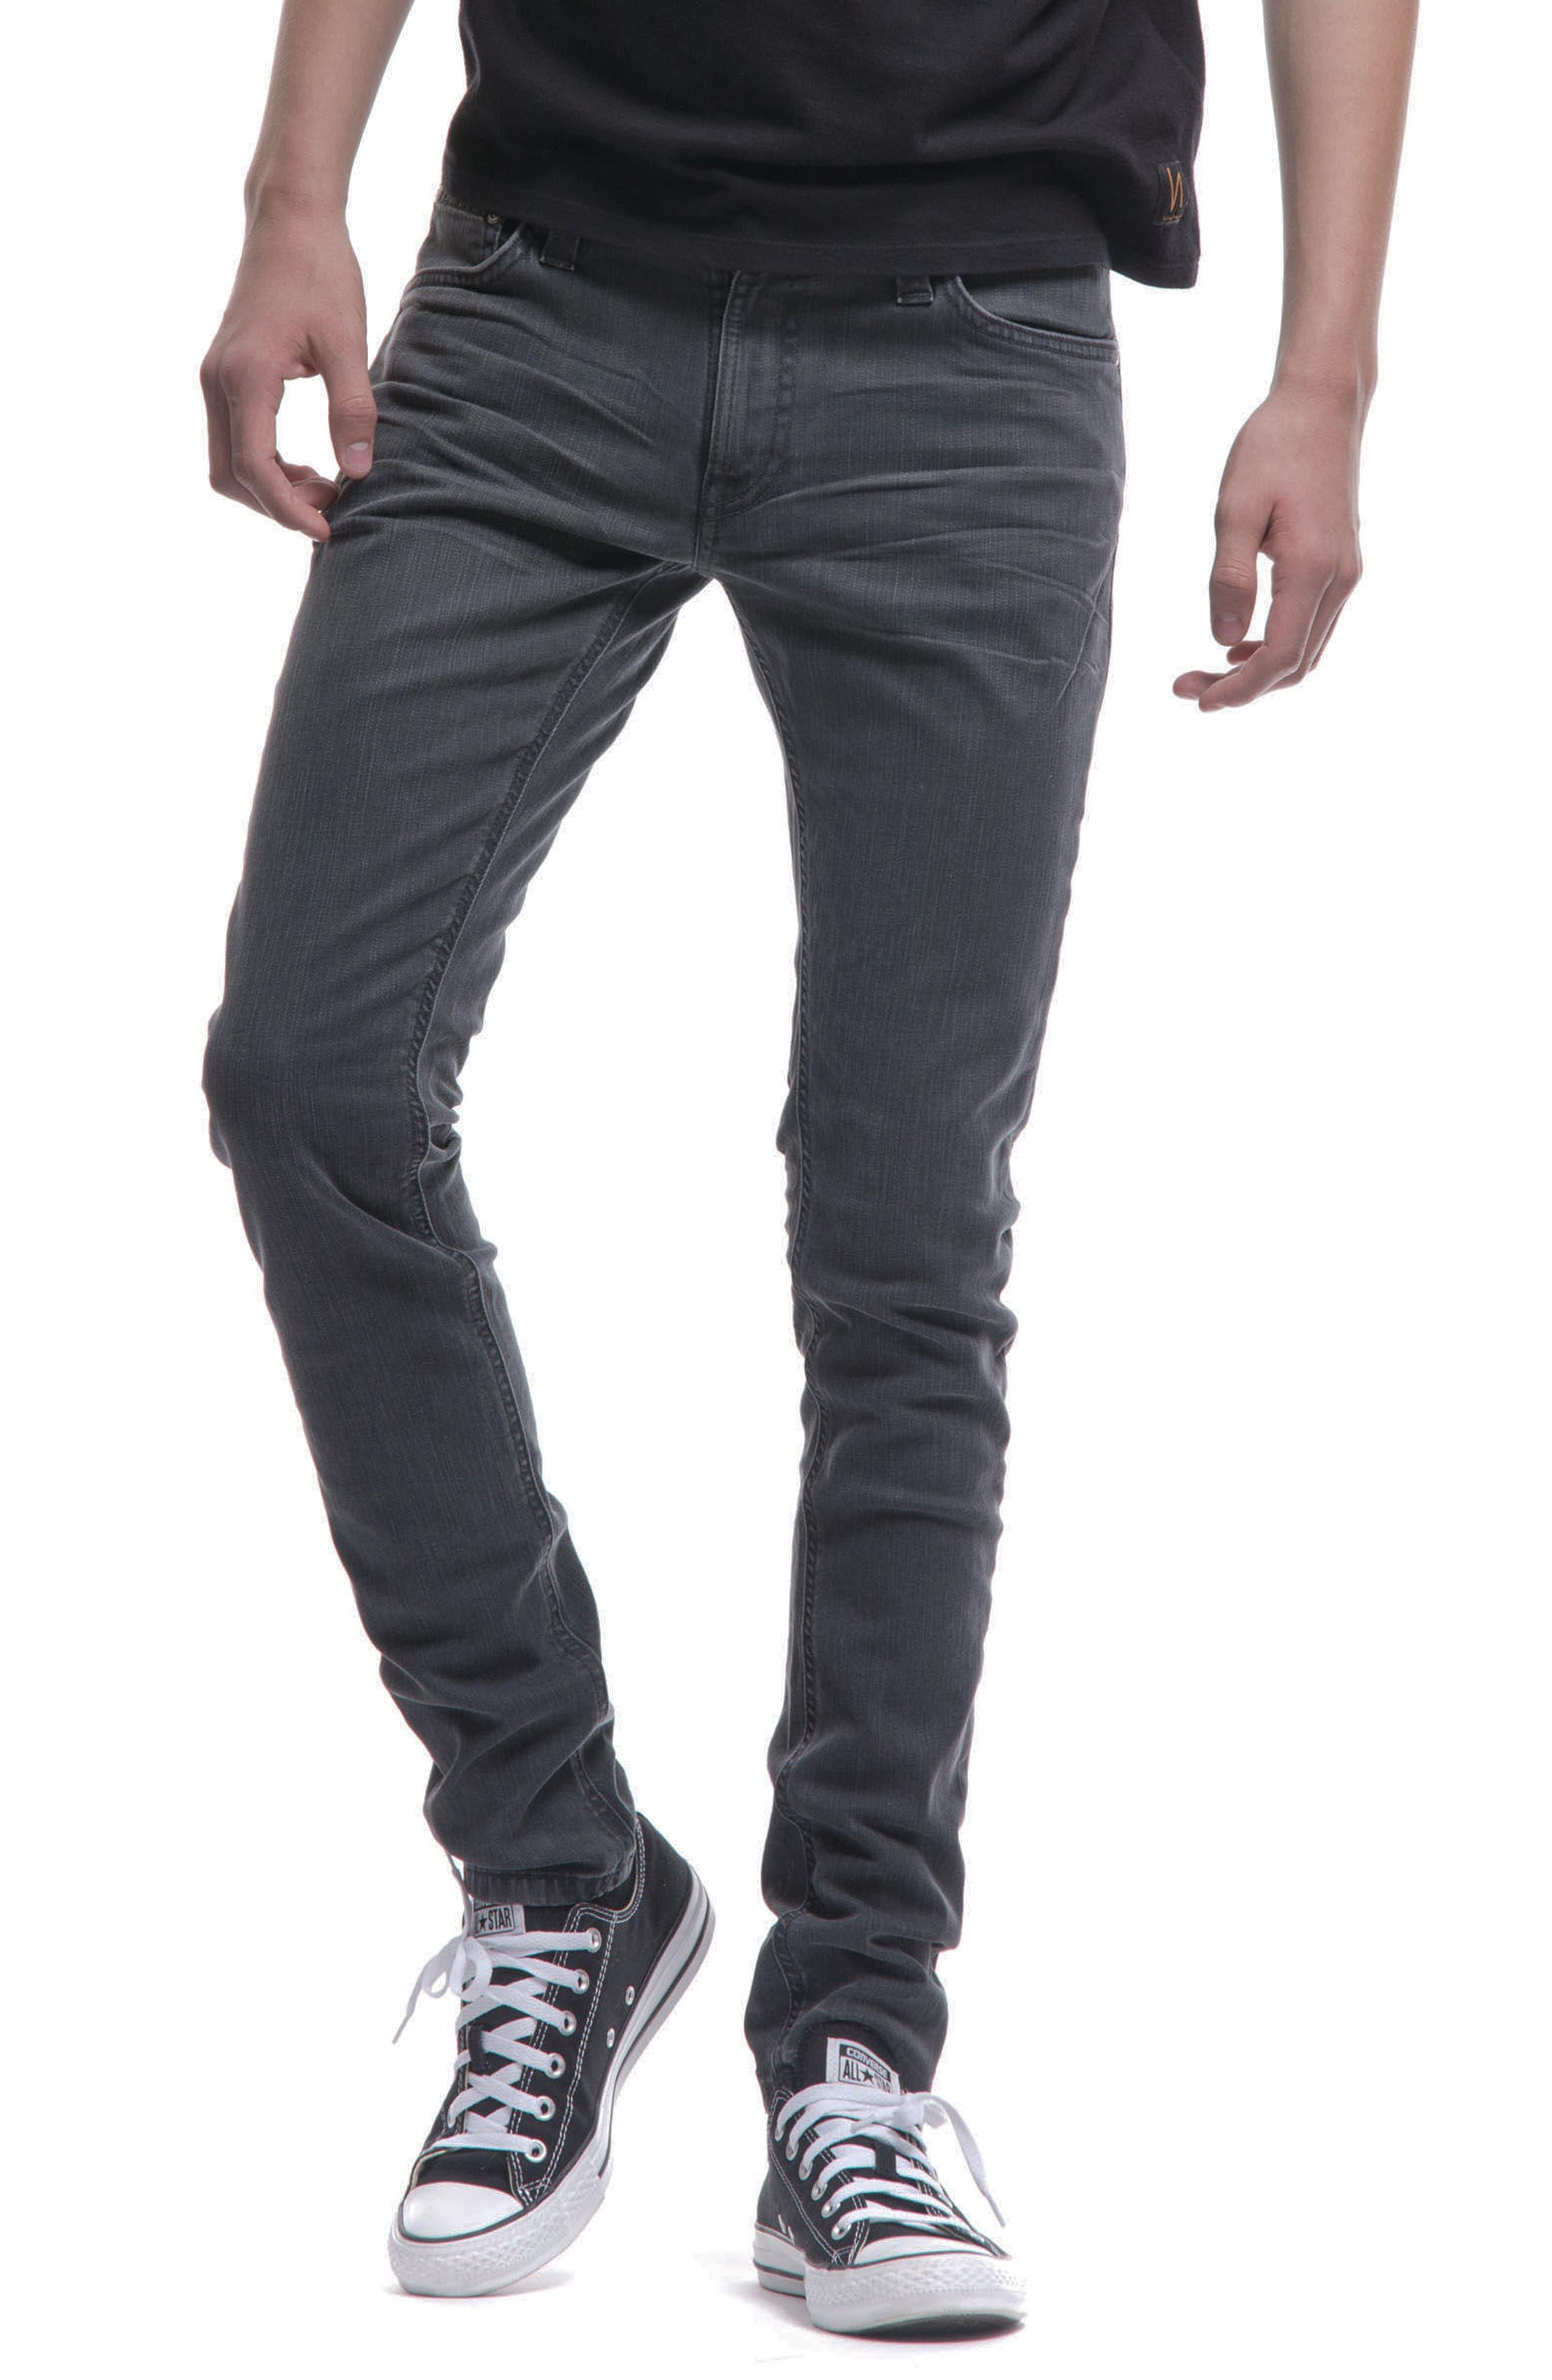 Skinny Lin Skinny Fit Jeans,                             Alternate thumbnail 4, color,                             Black Seas